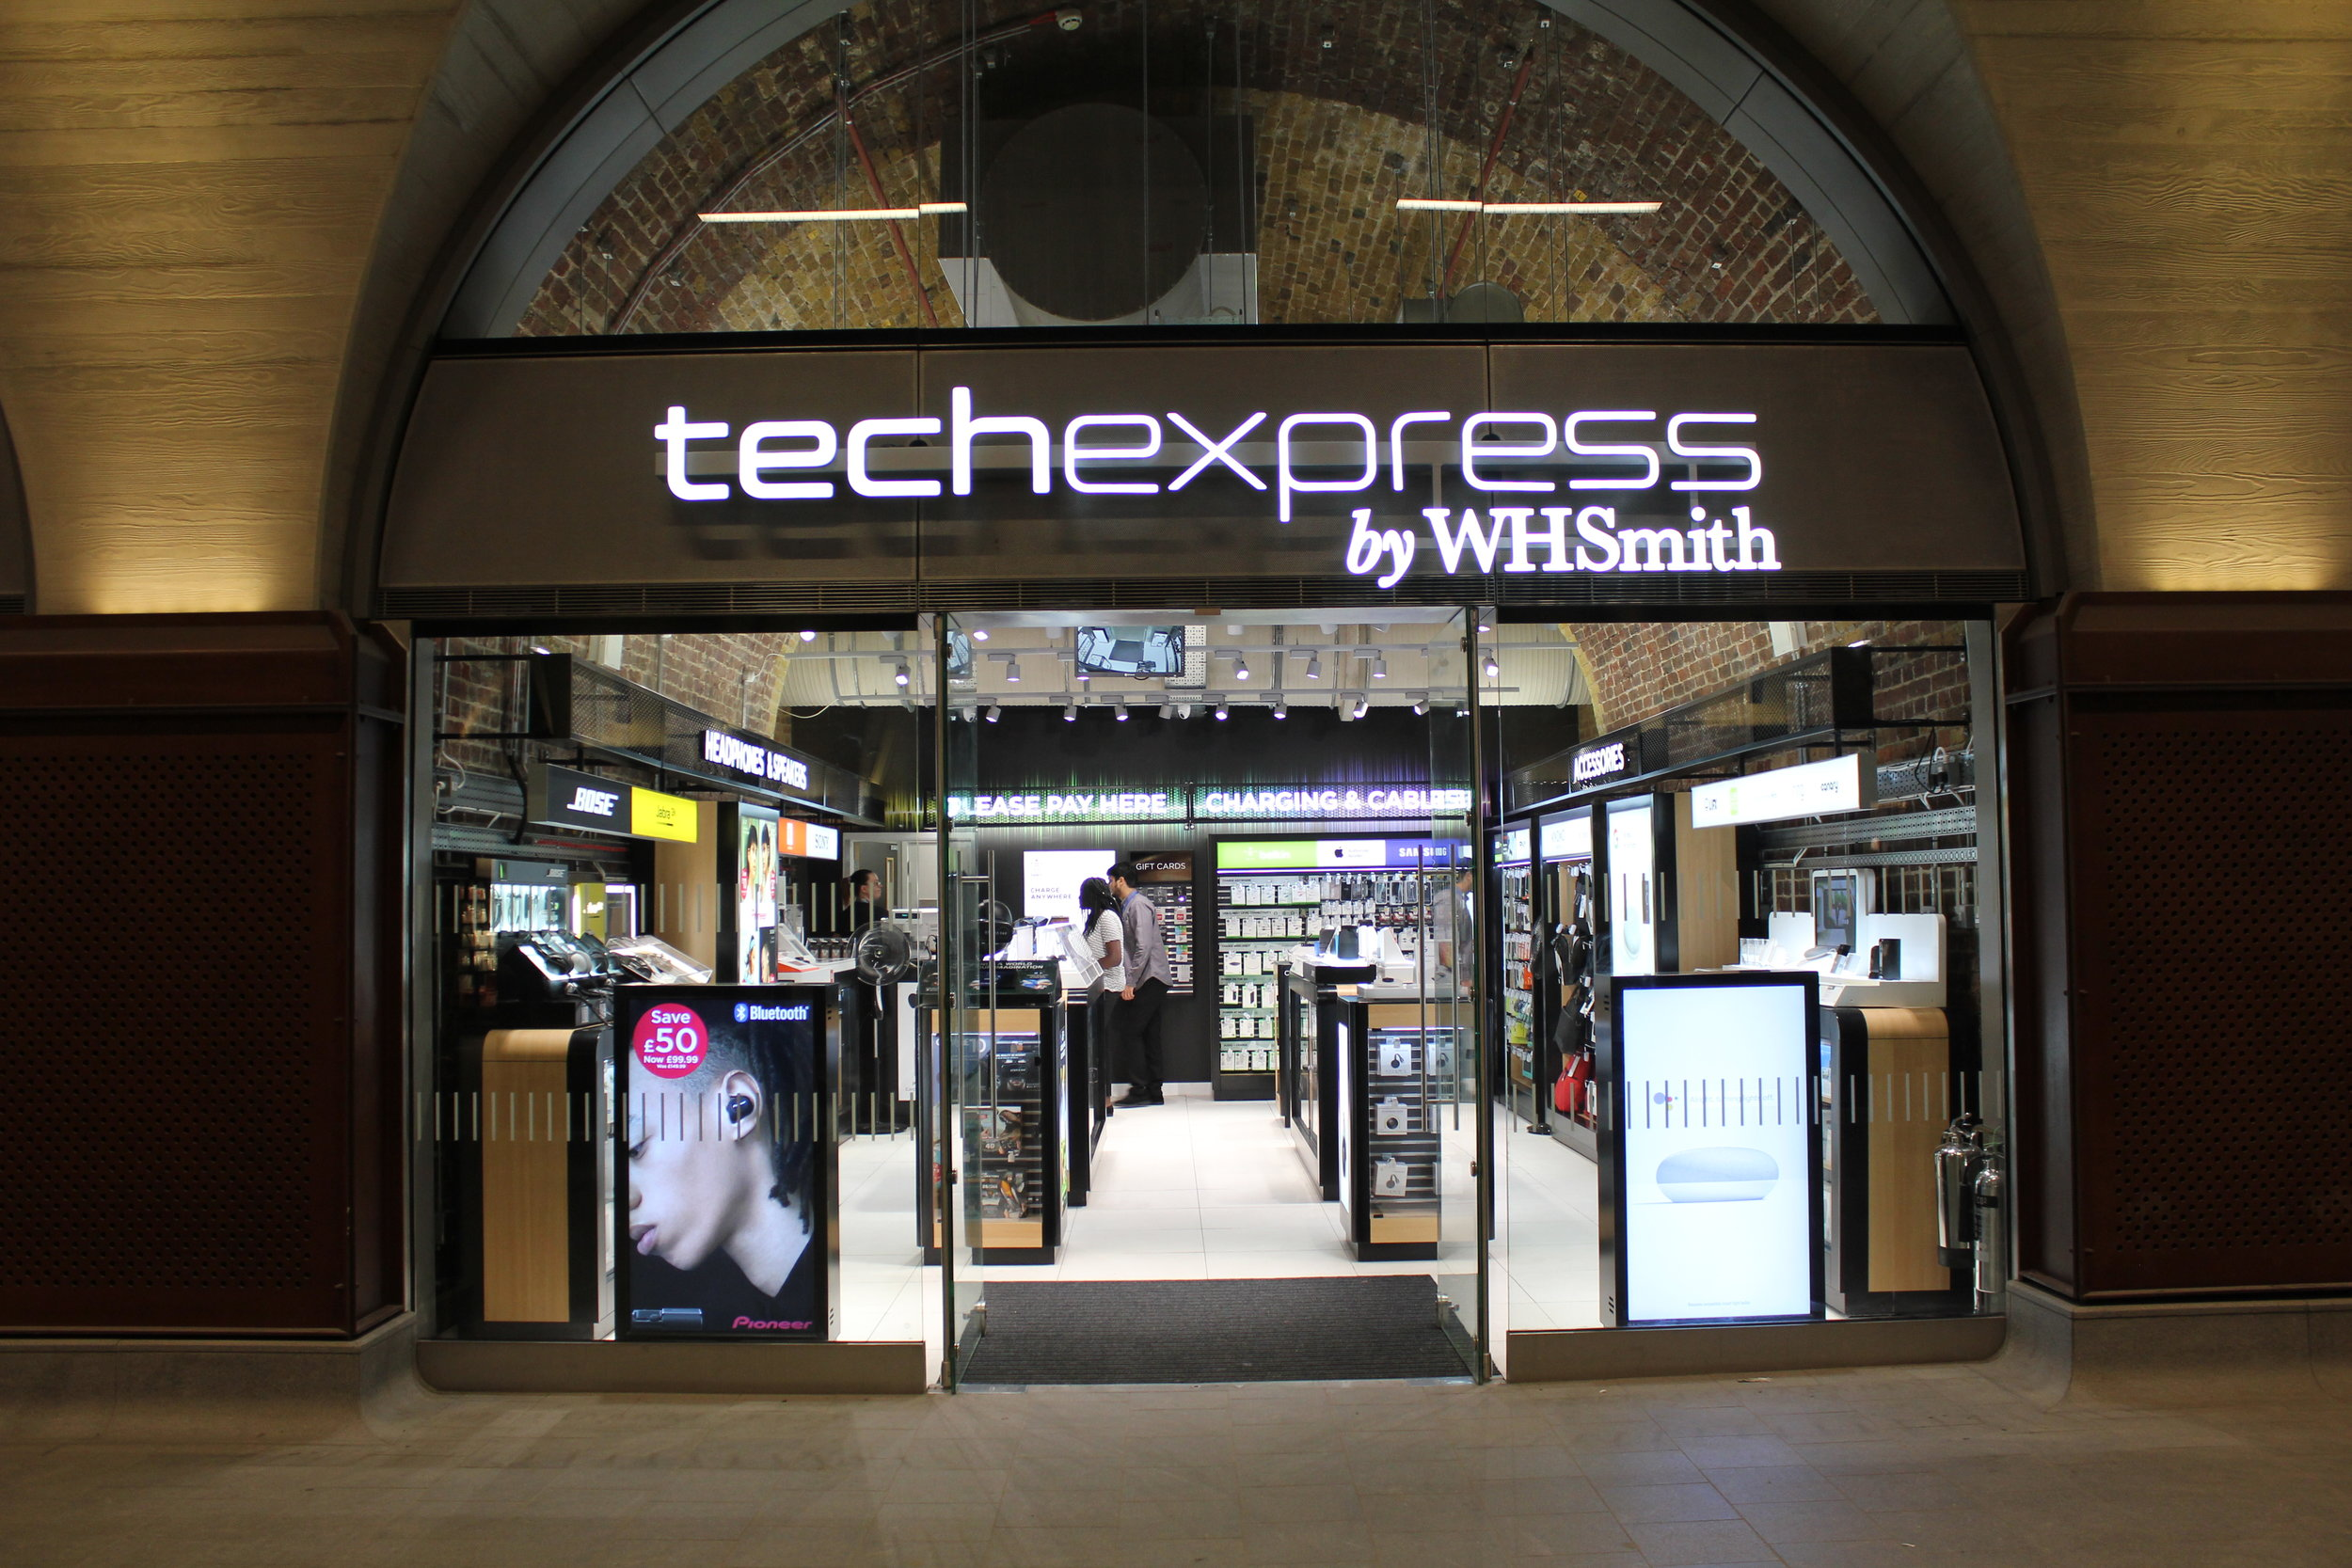 Tech Express WH Smith